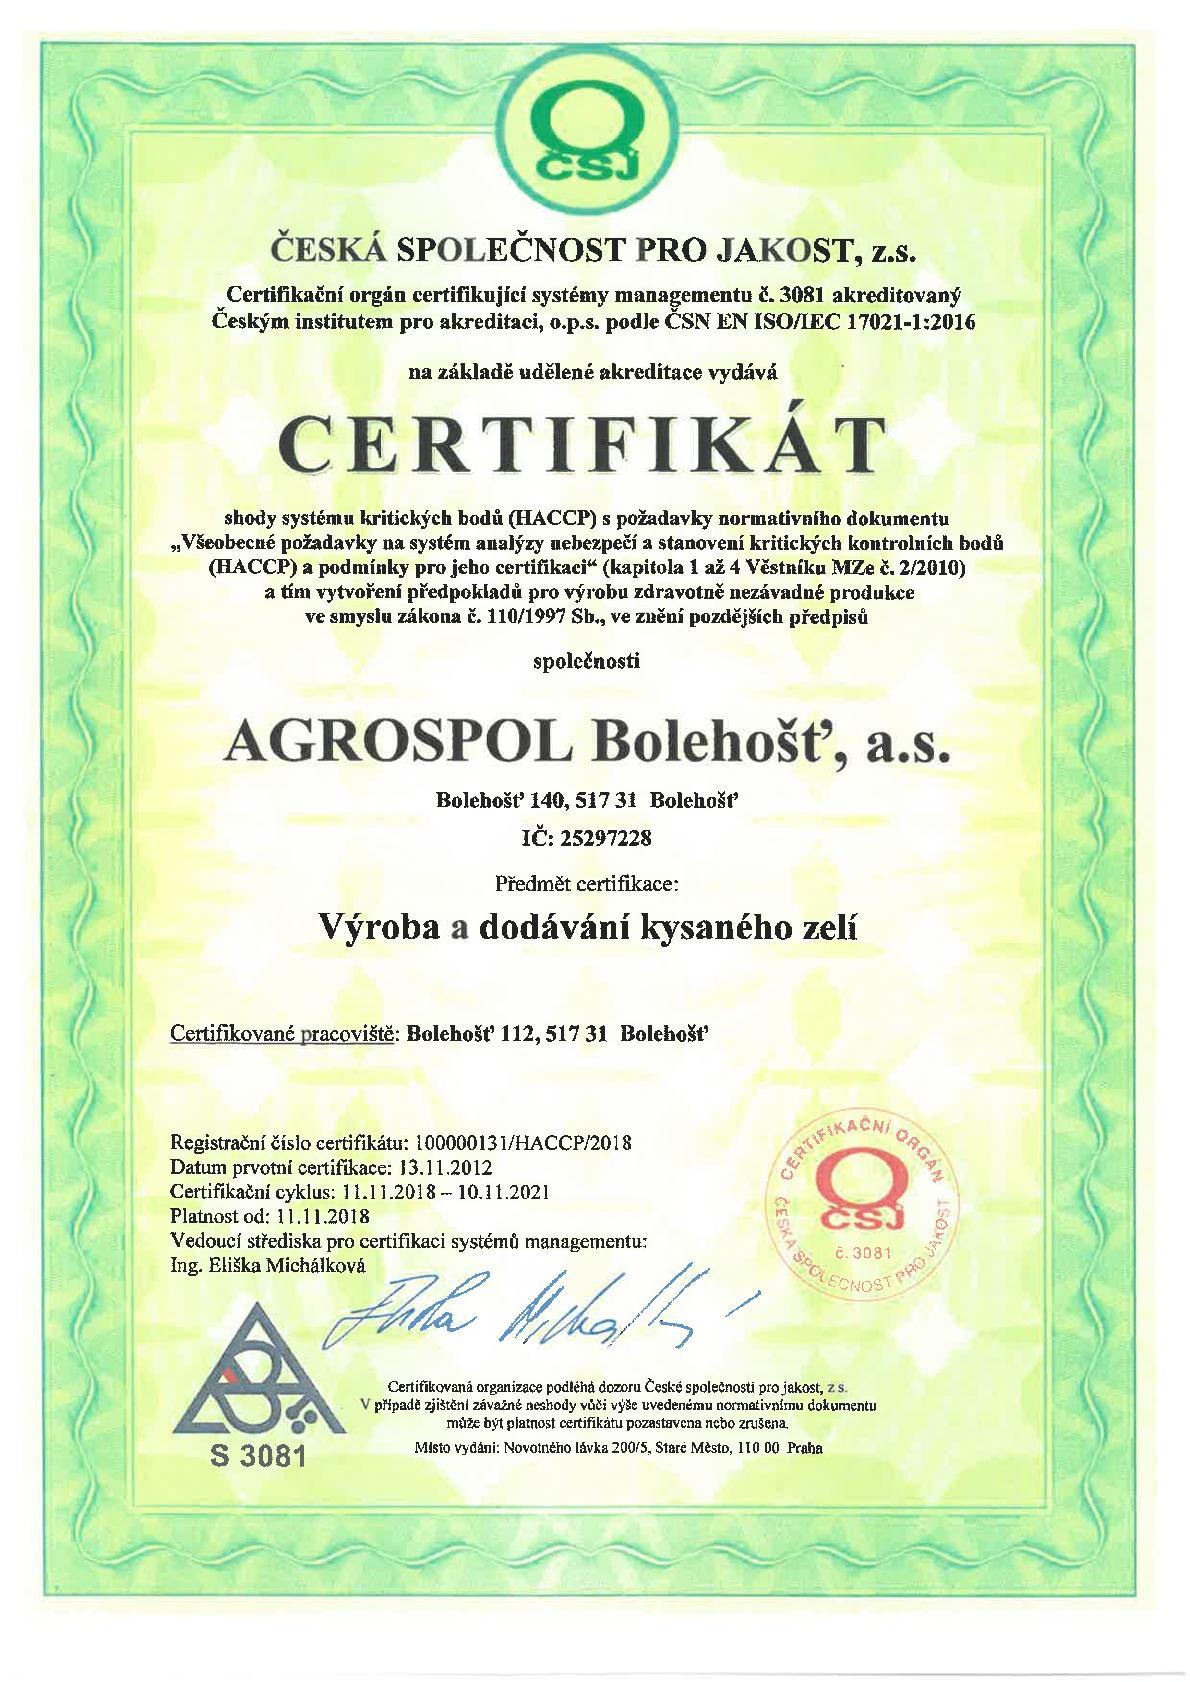 AGROSPOL Bolehošť, a. s. - Certifikát 02